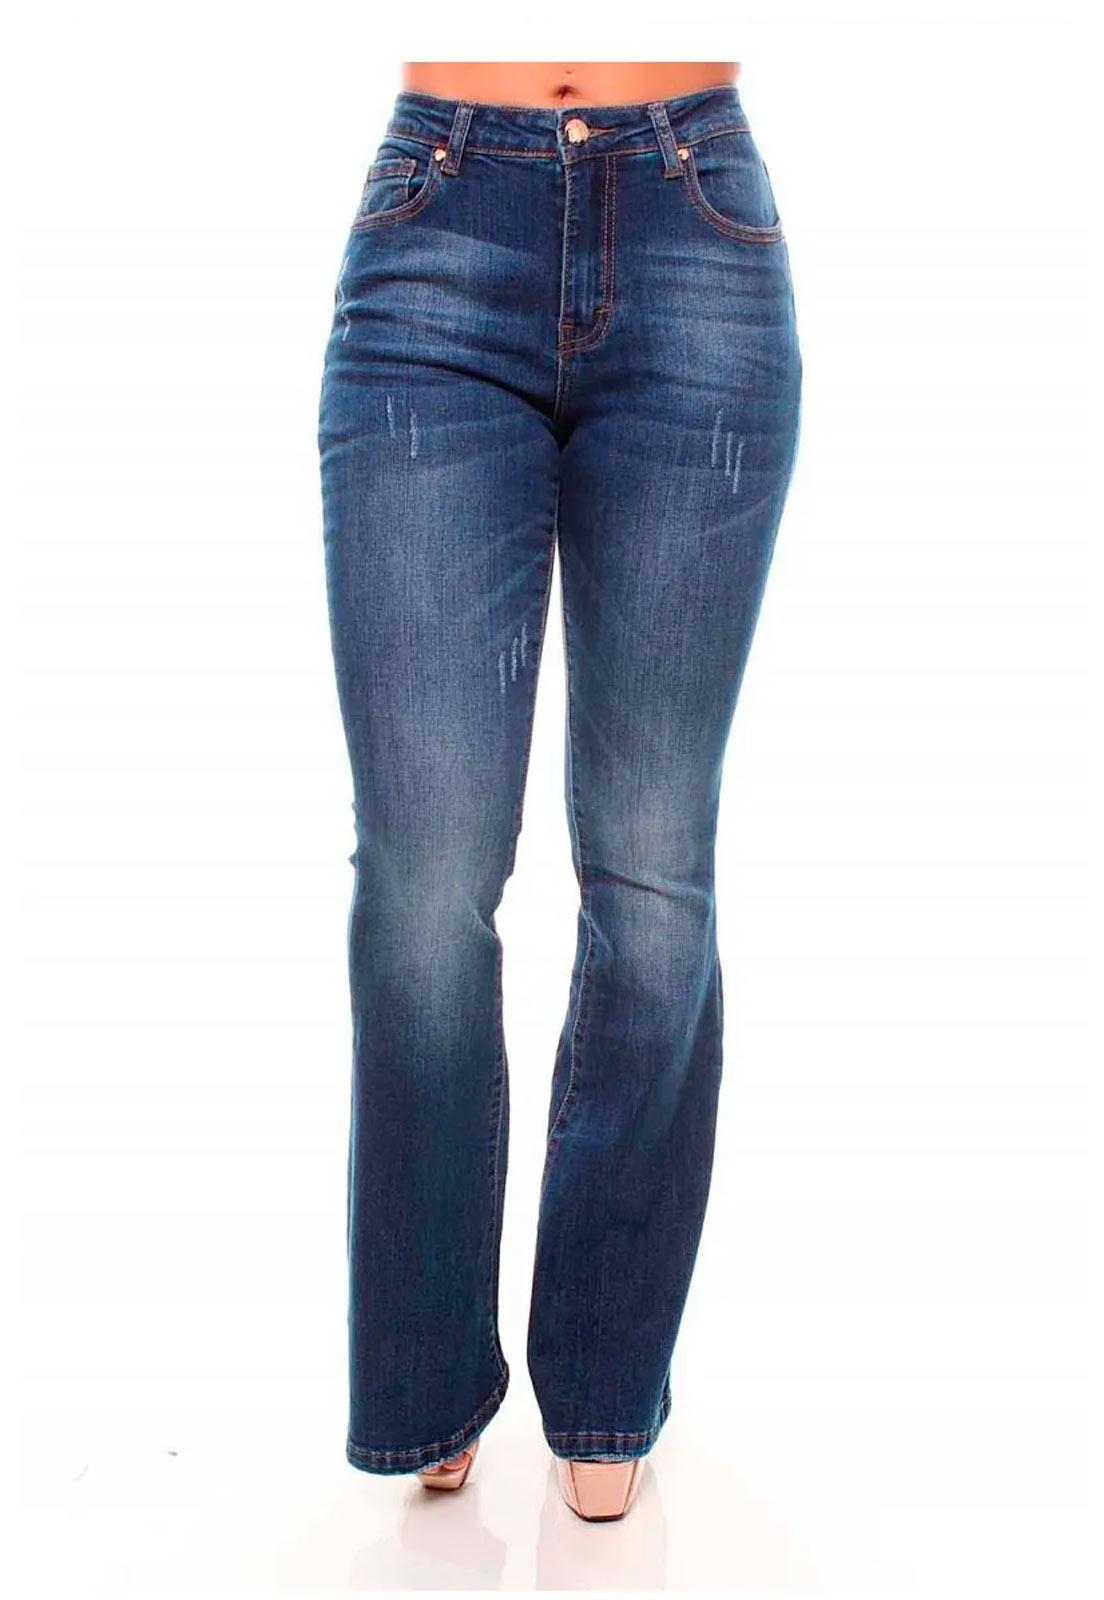 Calça Jeans Feminina Flare Crocker - 45853  - CROCKER JEANS